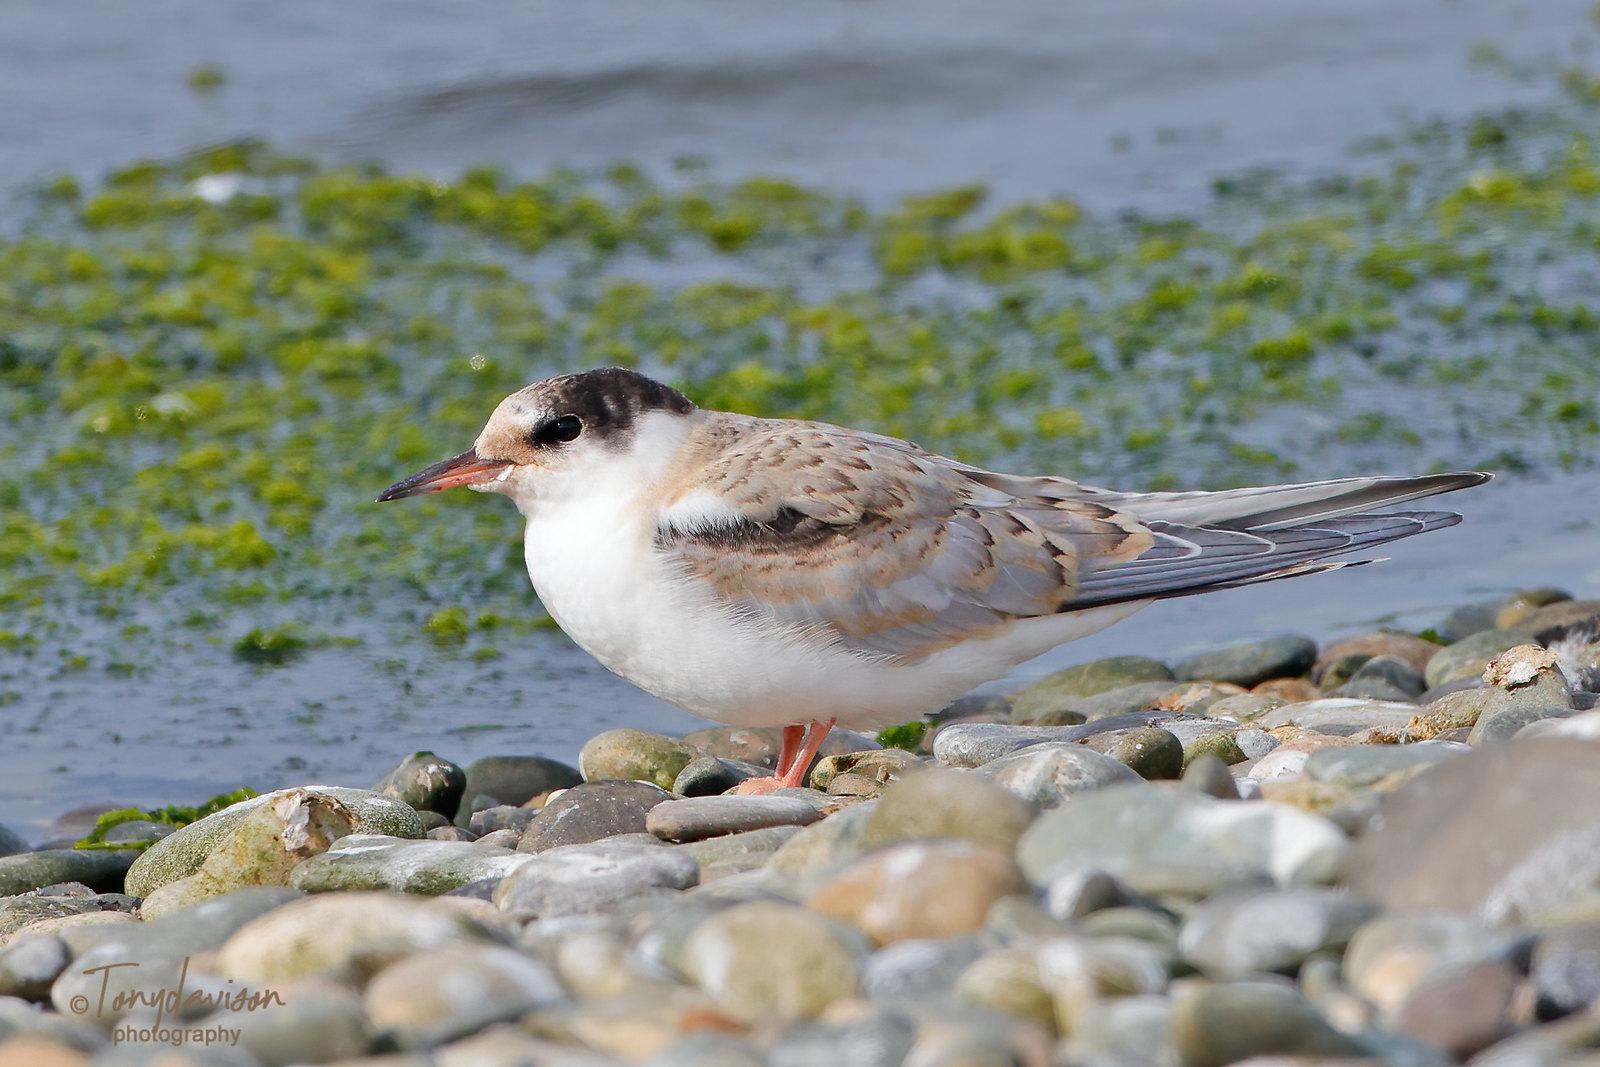 Common Tern - juvenile